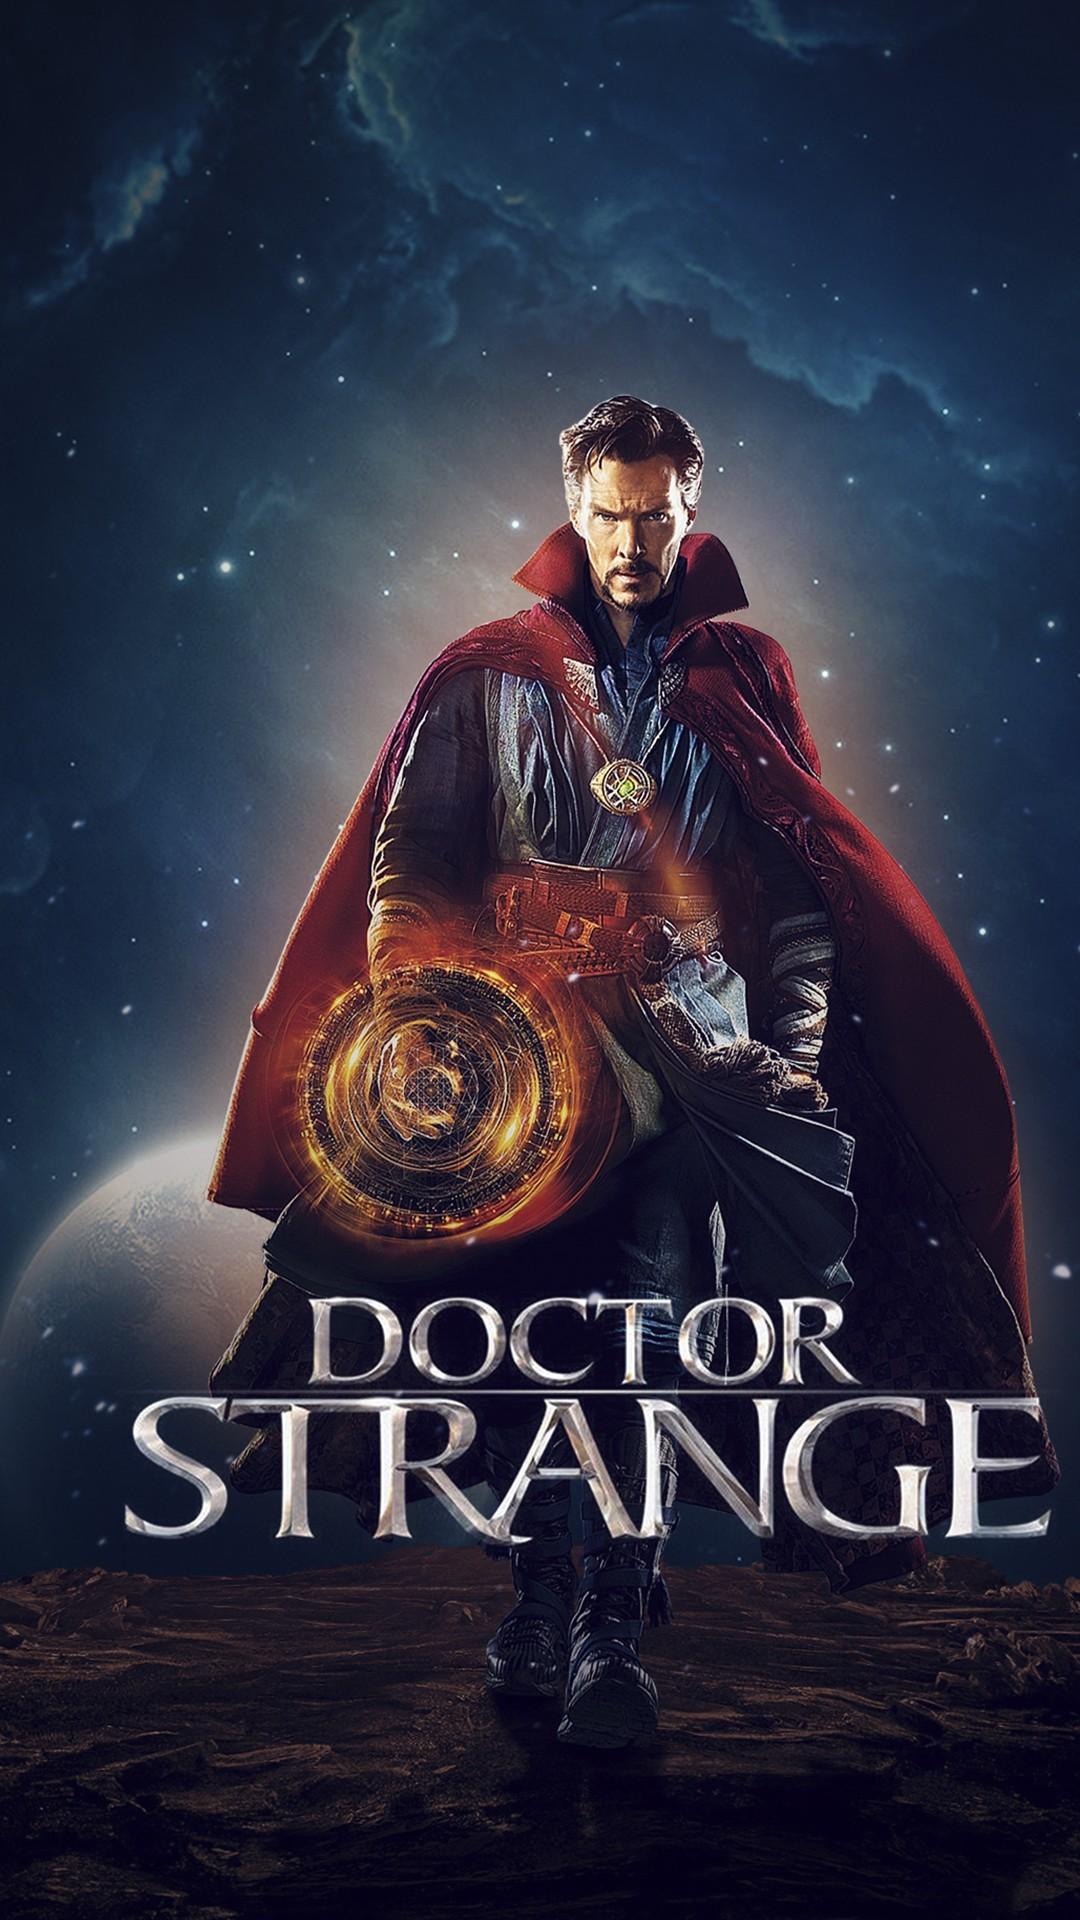 Free Doctor Strange phone wallpaper by ritajw